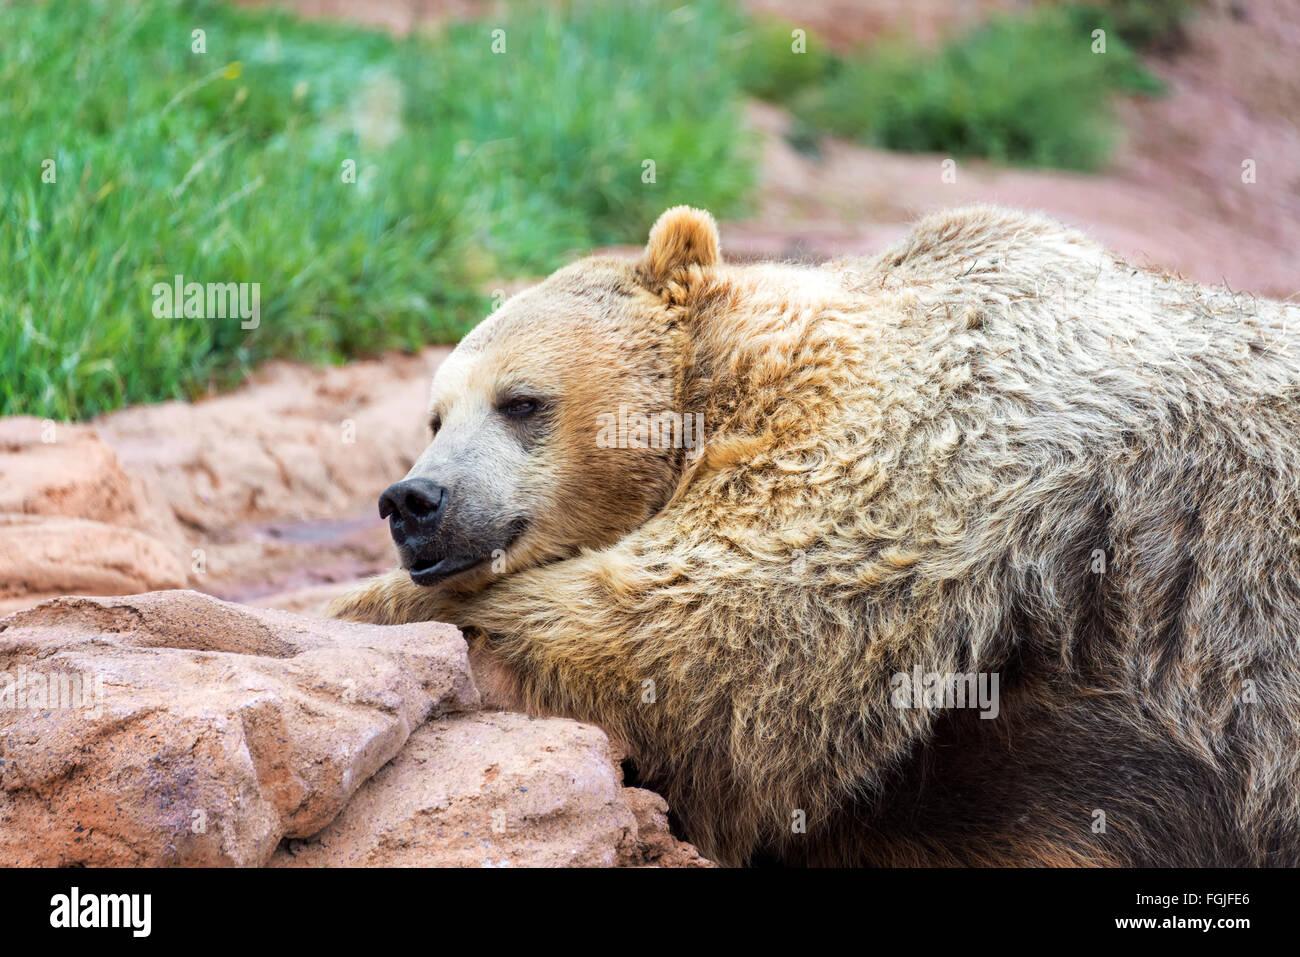 Acercamiento de un oso grizzly acostado Imagen De Stock